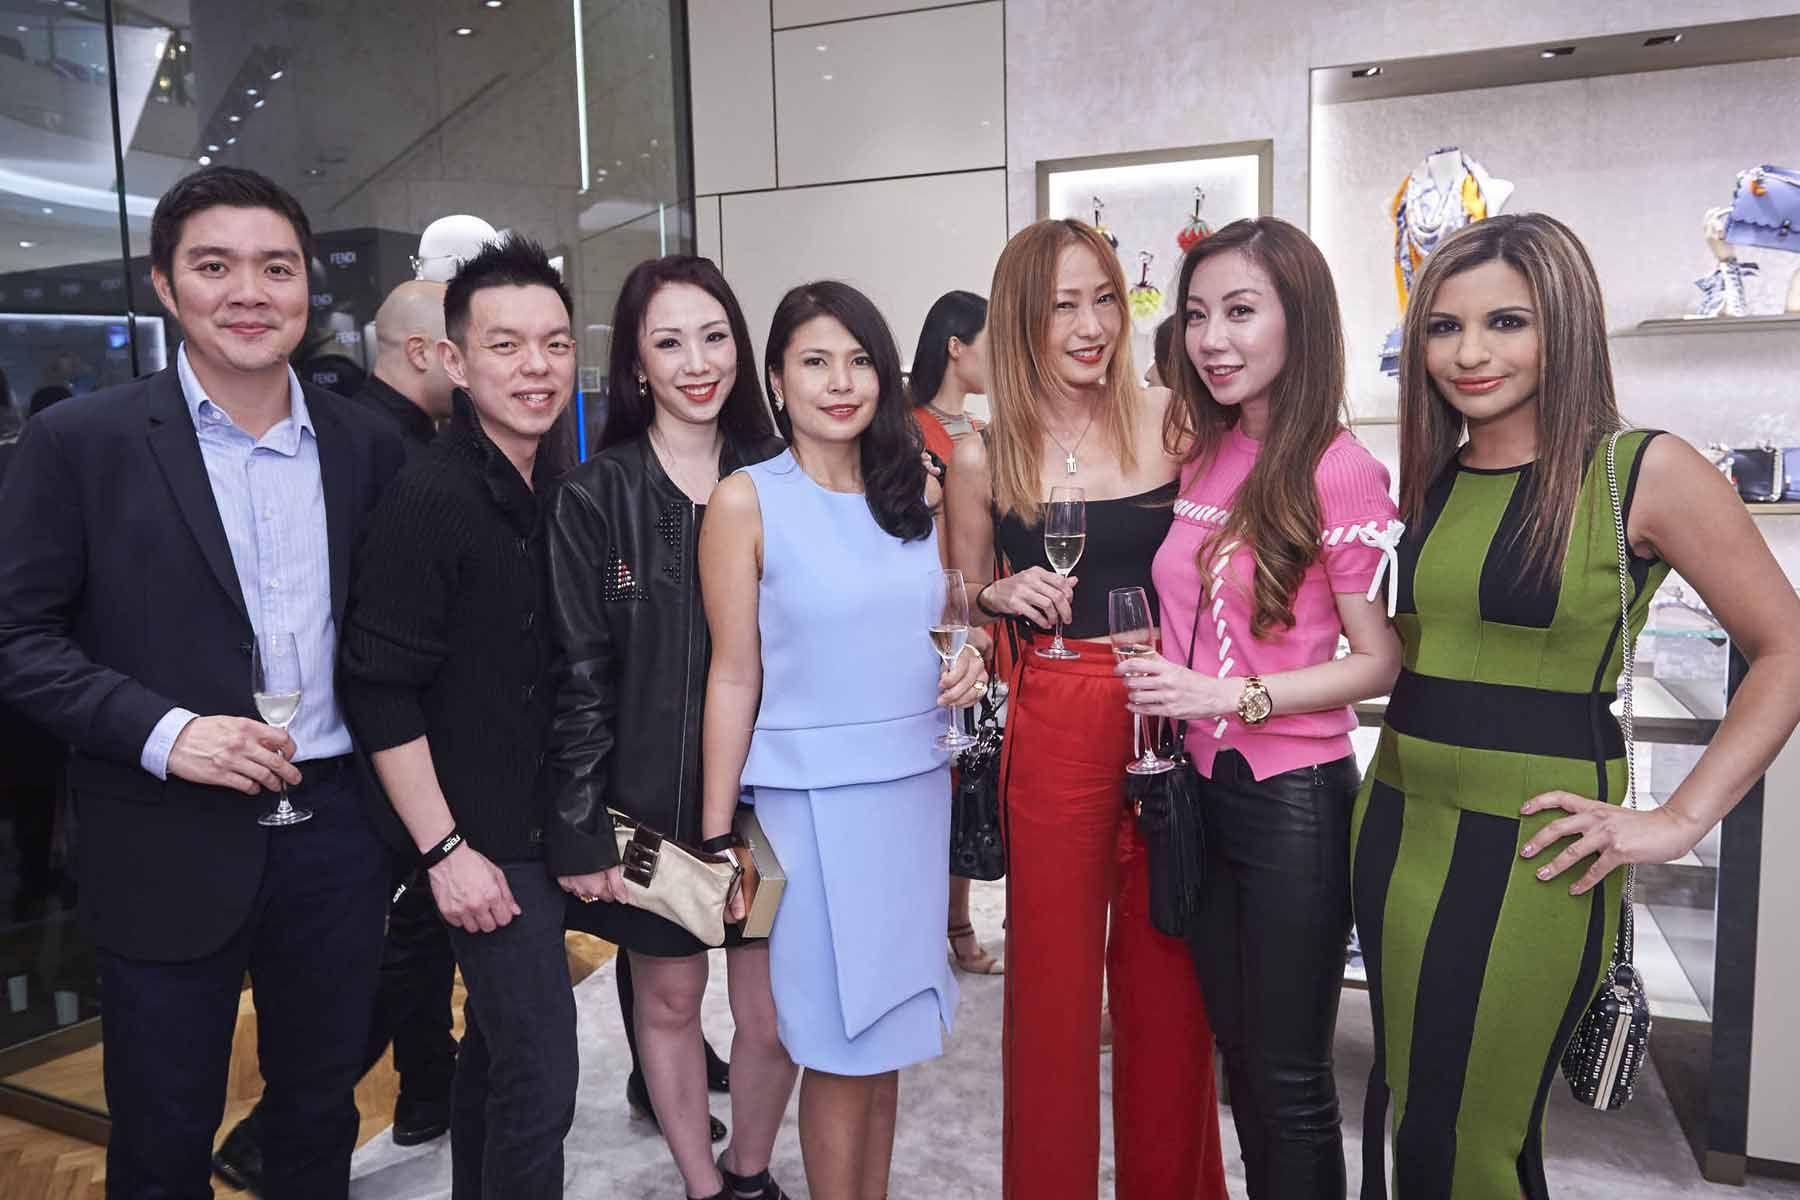 Shaun Tay, Adrian Ng, Loh May-Han, Marilyn Lum, Tan Min-Li, Alicia Loke, Rasina Rubin